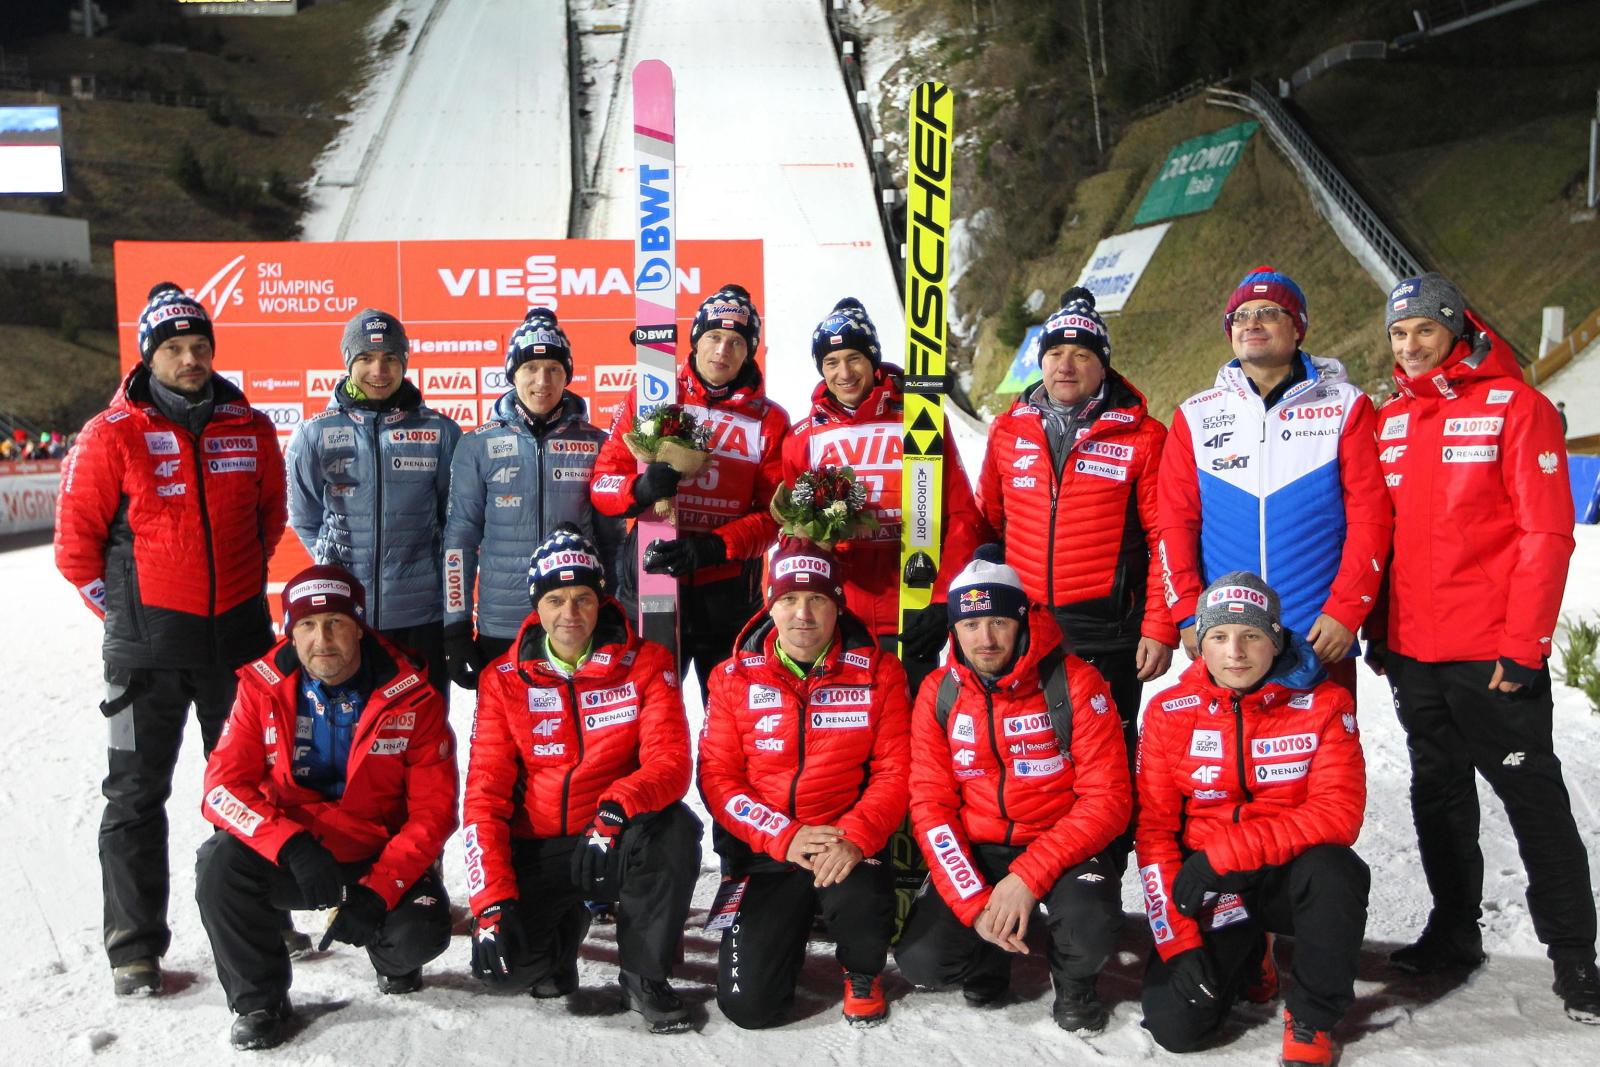 Polska reprezentacja w skokach narciarskich fot.  EPA/ANDREA SOLERO